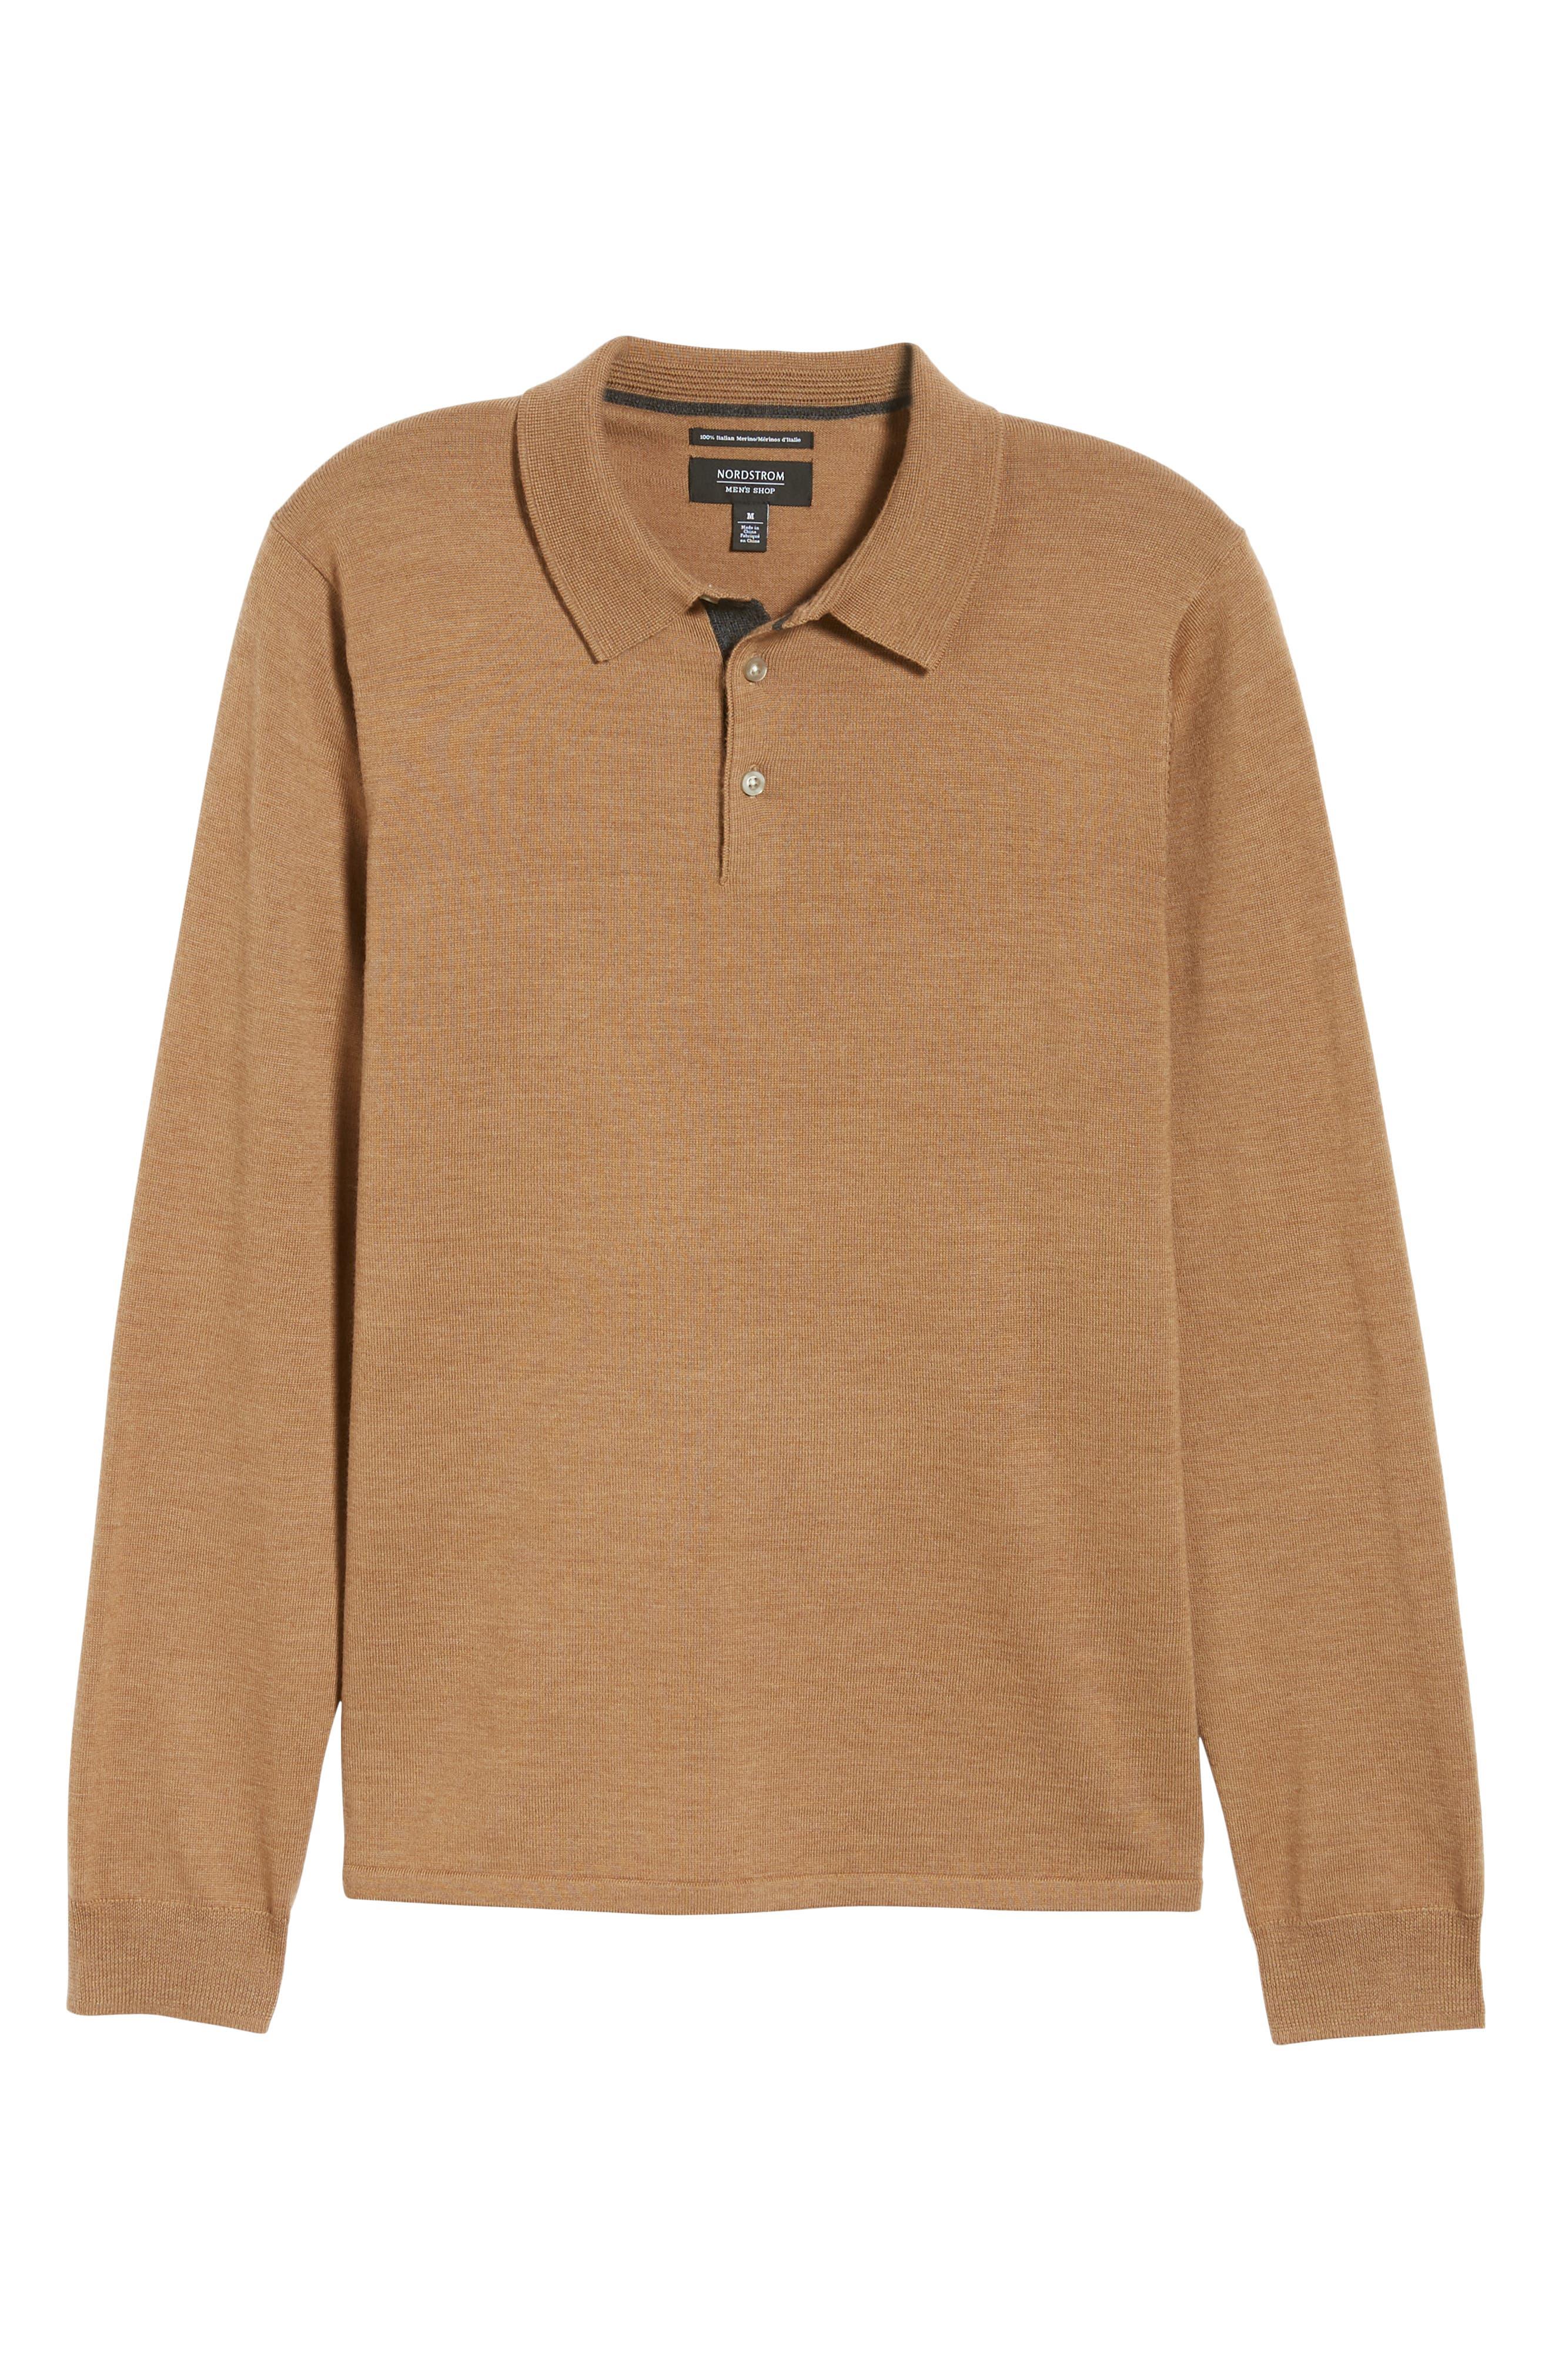 NORDSTROM MEN'S SHOP,                             Merino Wool Polo Sweater,                             Alternate thumbnail 6, color,                             211